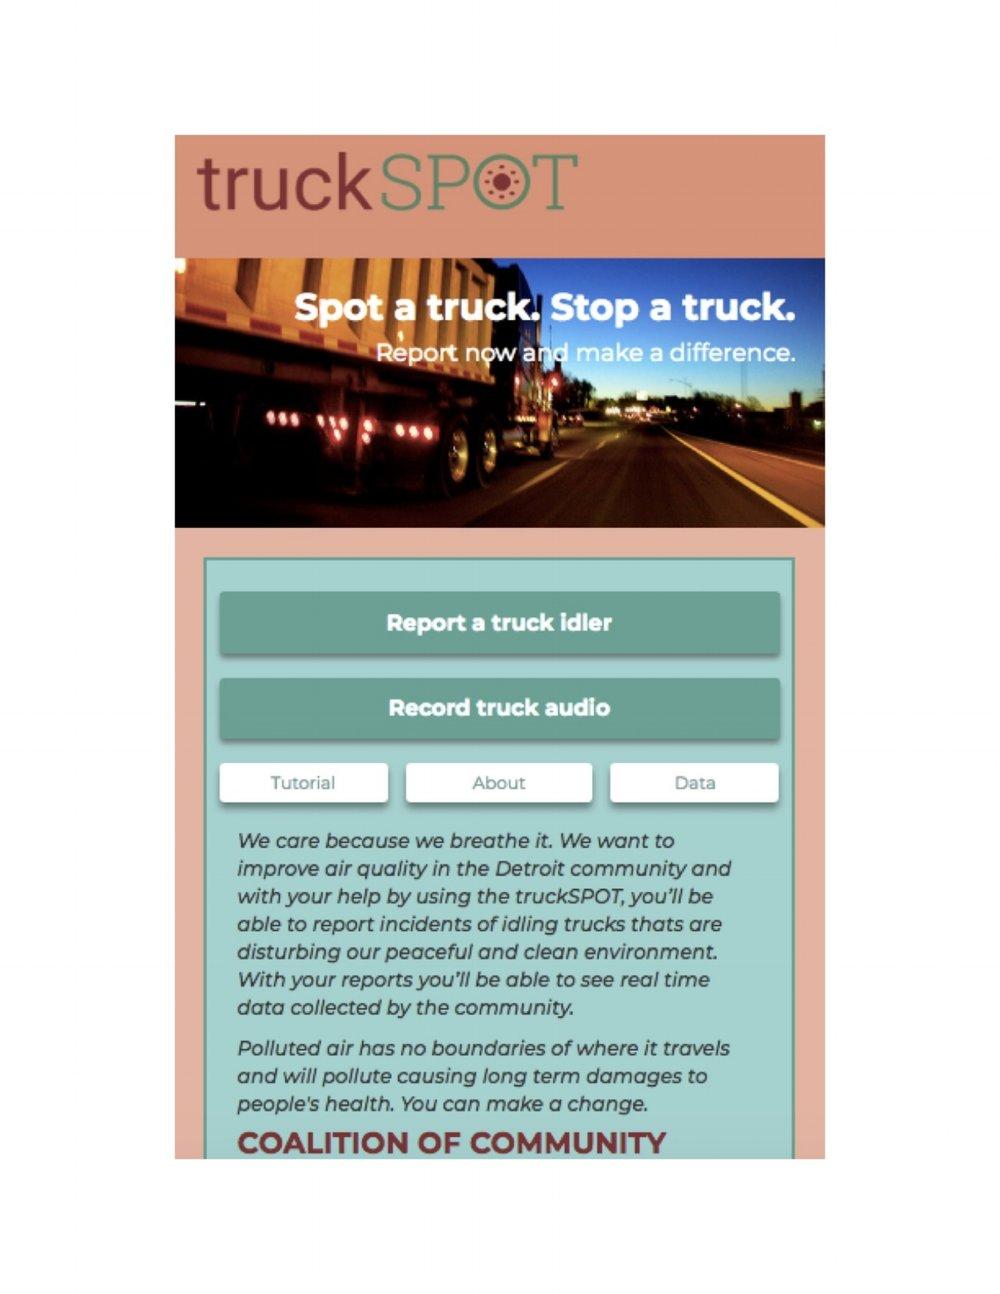 truckspotgraceinaction.jpg